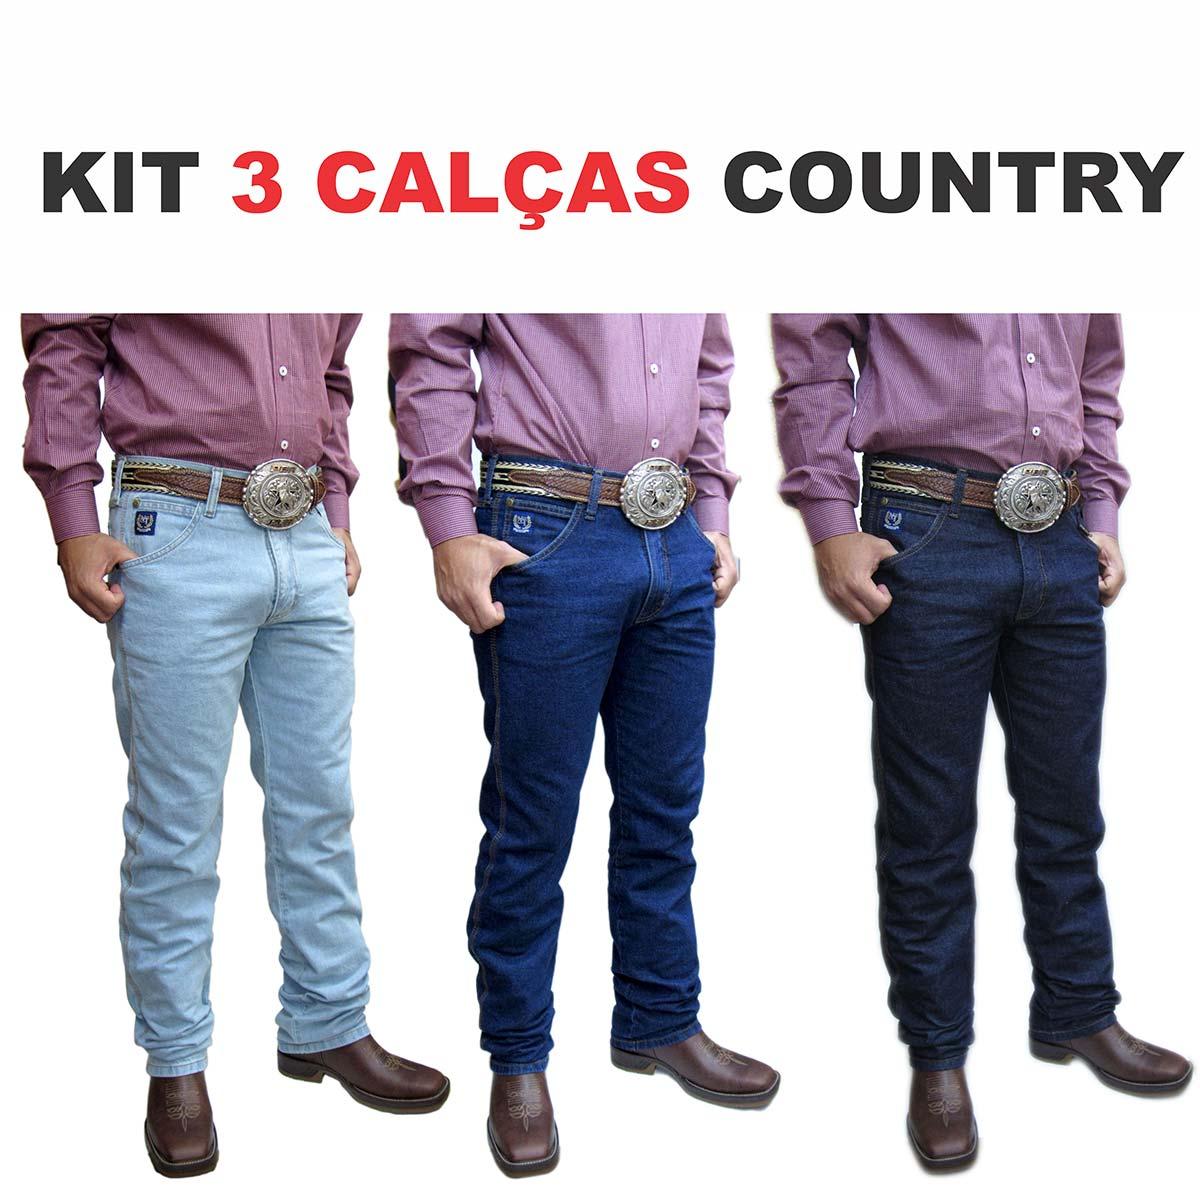 53ea34030 Kit 3 Calças Jeans Country Masculina Nossa Terra Farm Tradicional ...